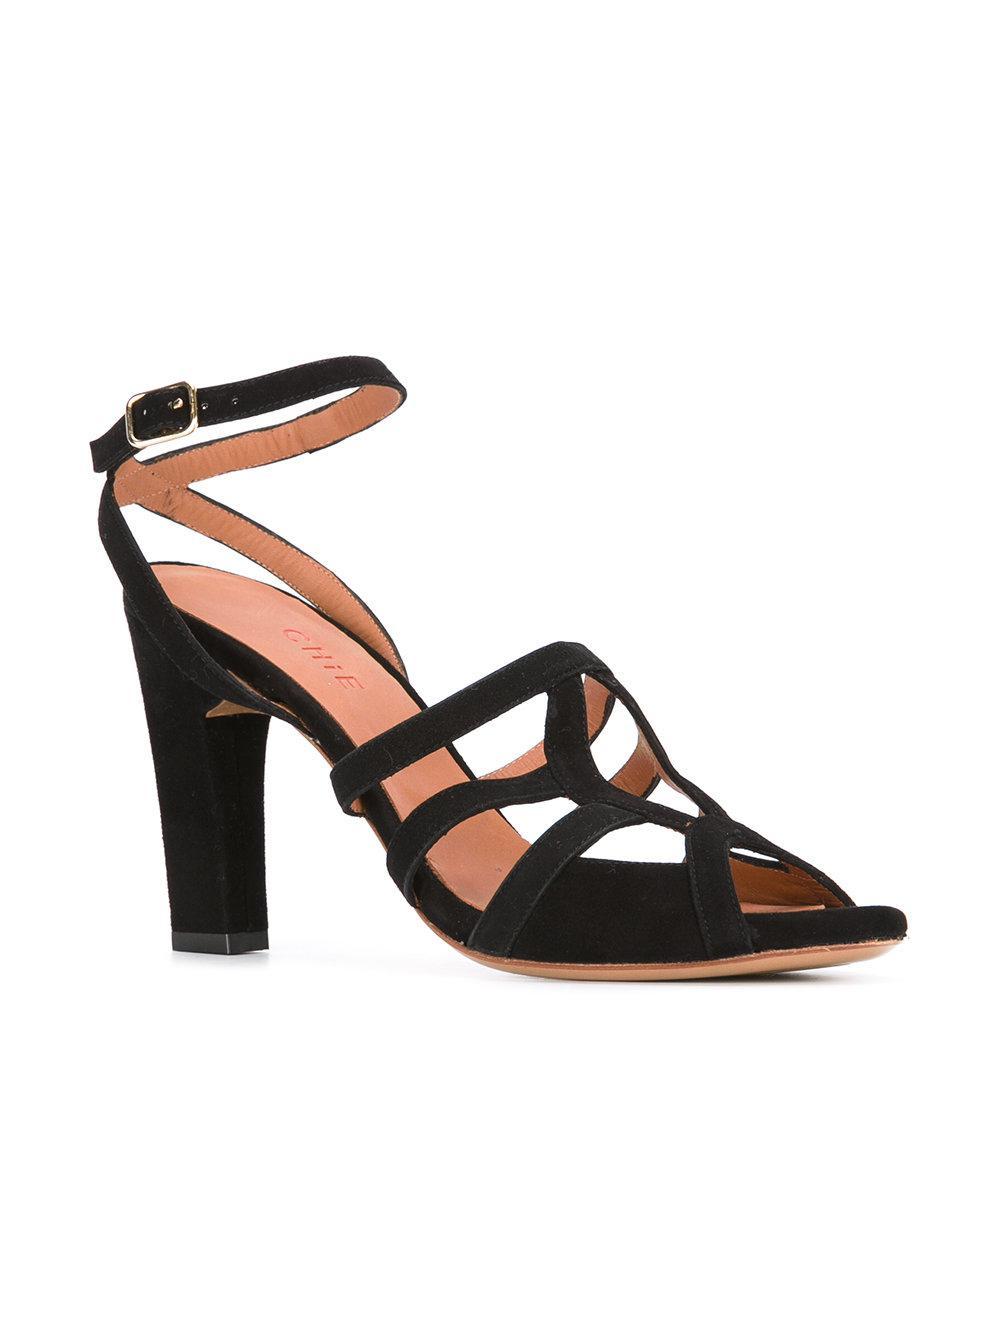 Saphira sandals - Black Chie Mihara kfbD3iSP